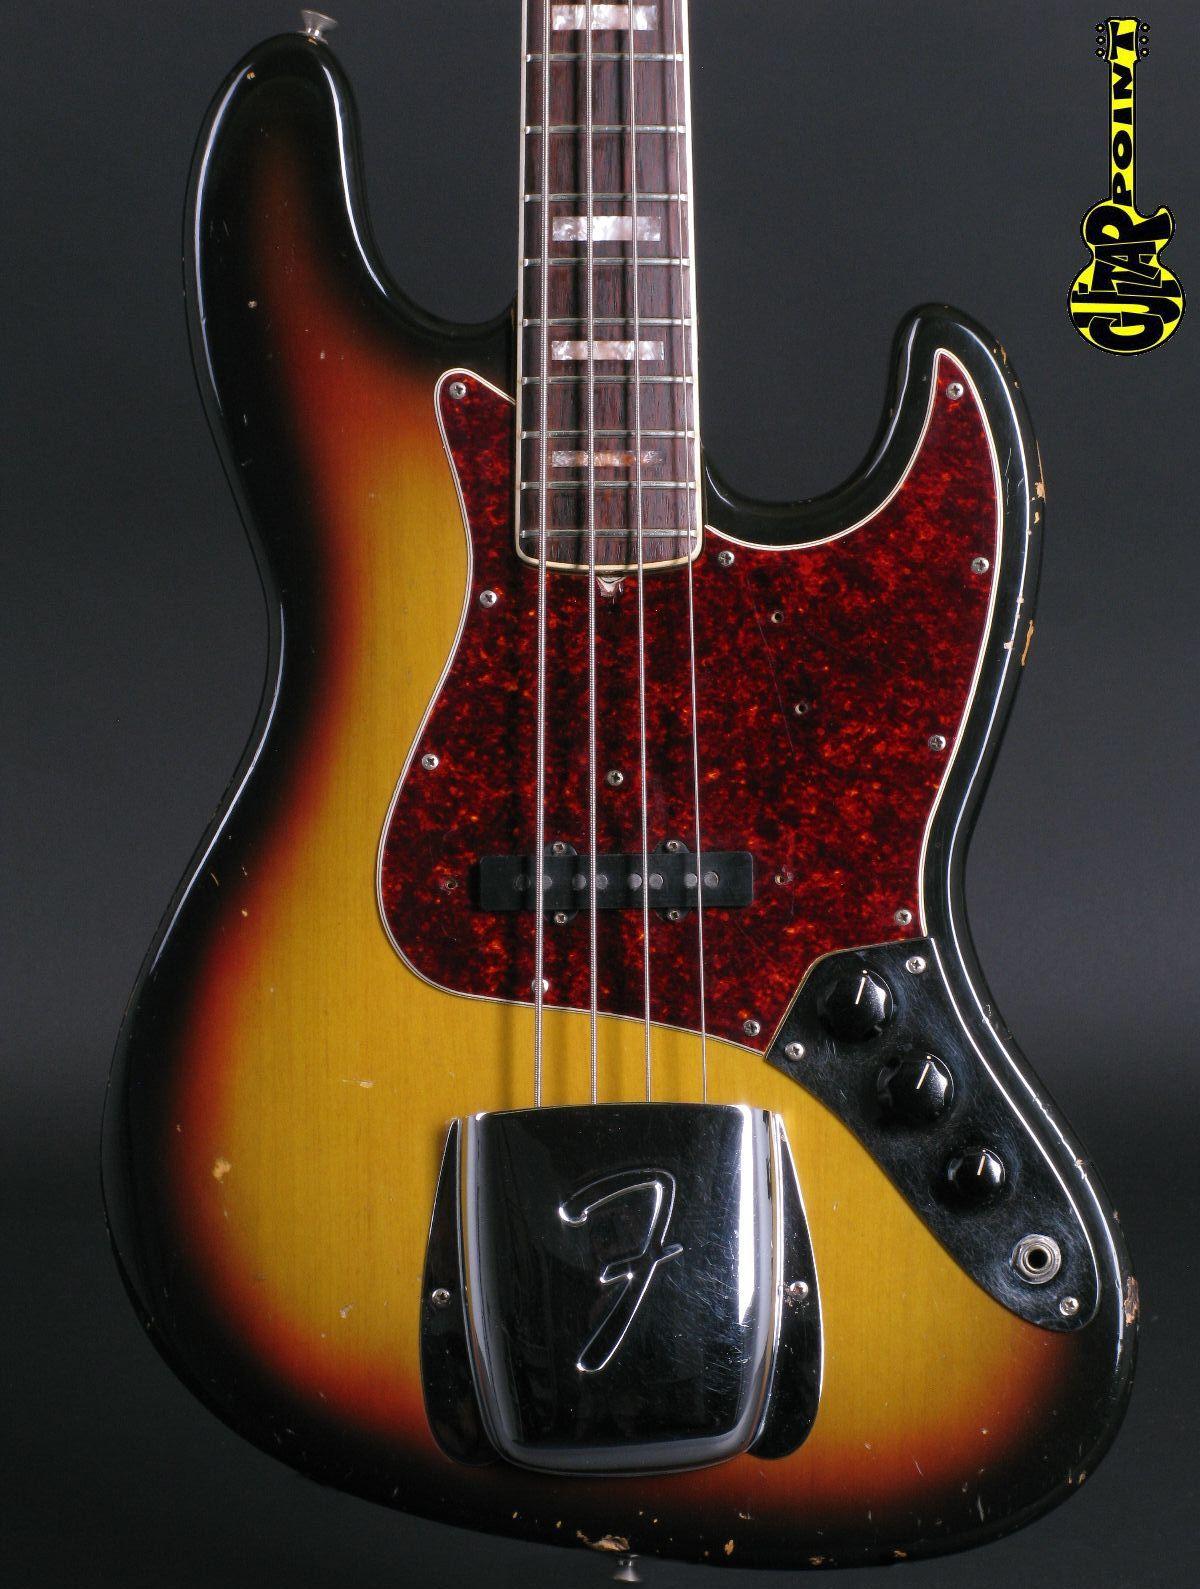 1969 Fender Jazz Bass - 3t-Sunburst